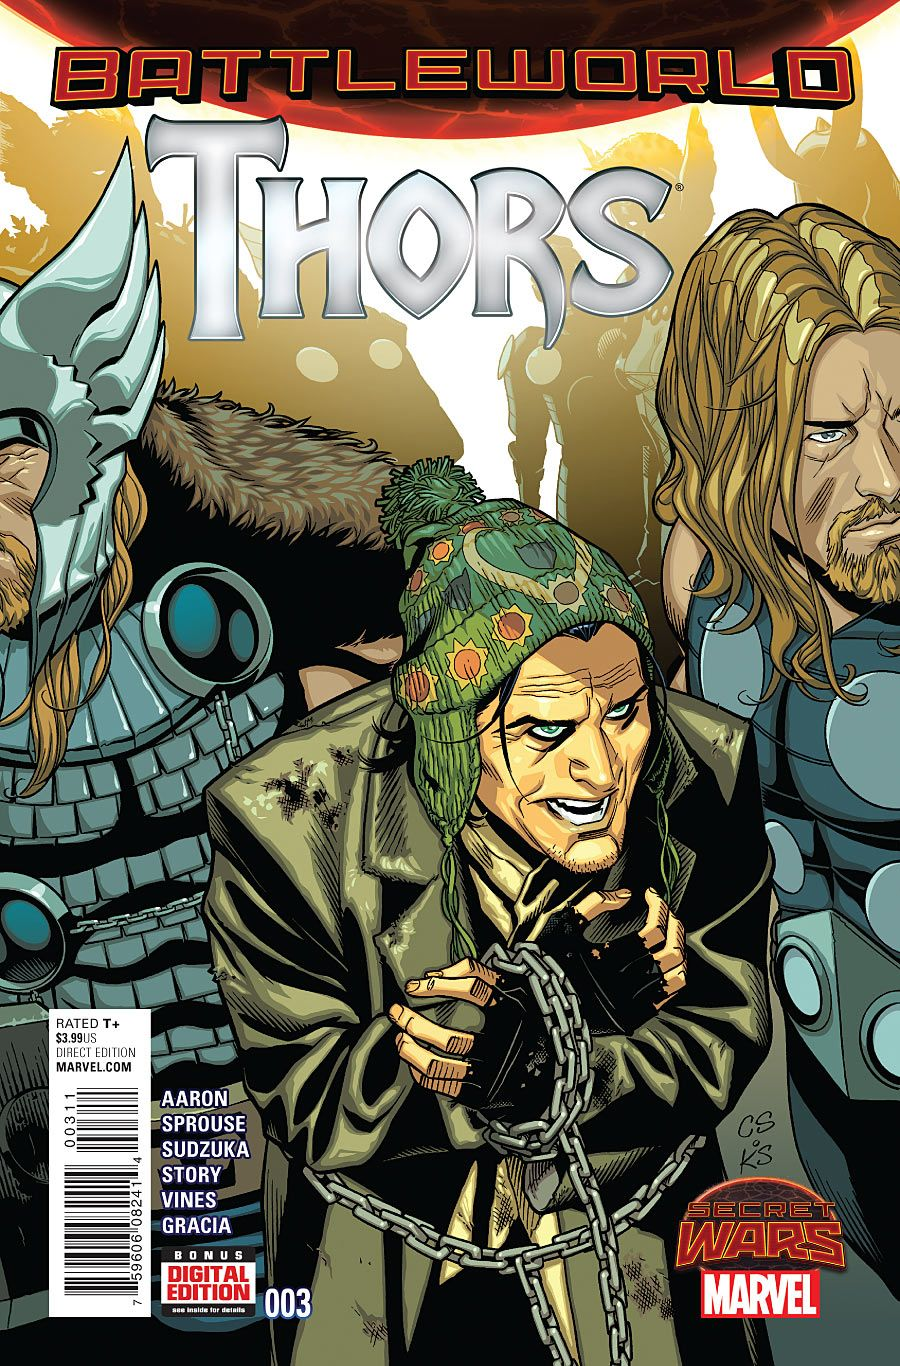 Thors #3 November 2015 https://www.facebook.com/The-Nerd-Rave-113442648801172/?ref=bookmarks #thenerdrave #marvel #comics #thors #battleworld #thor #loki #secretwars